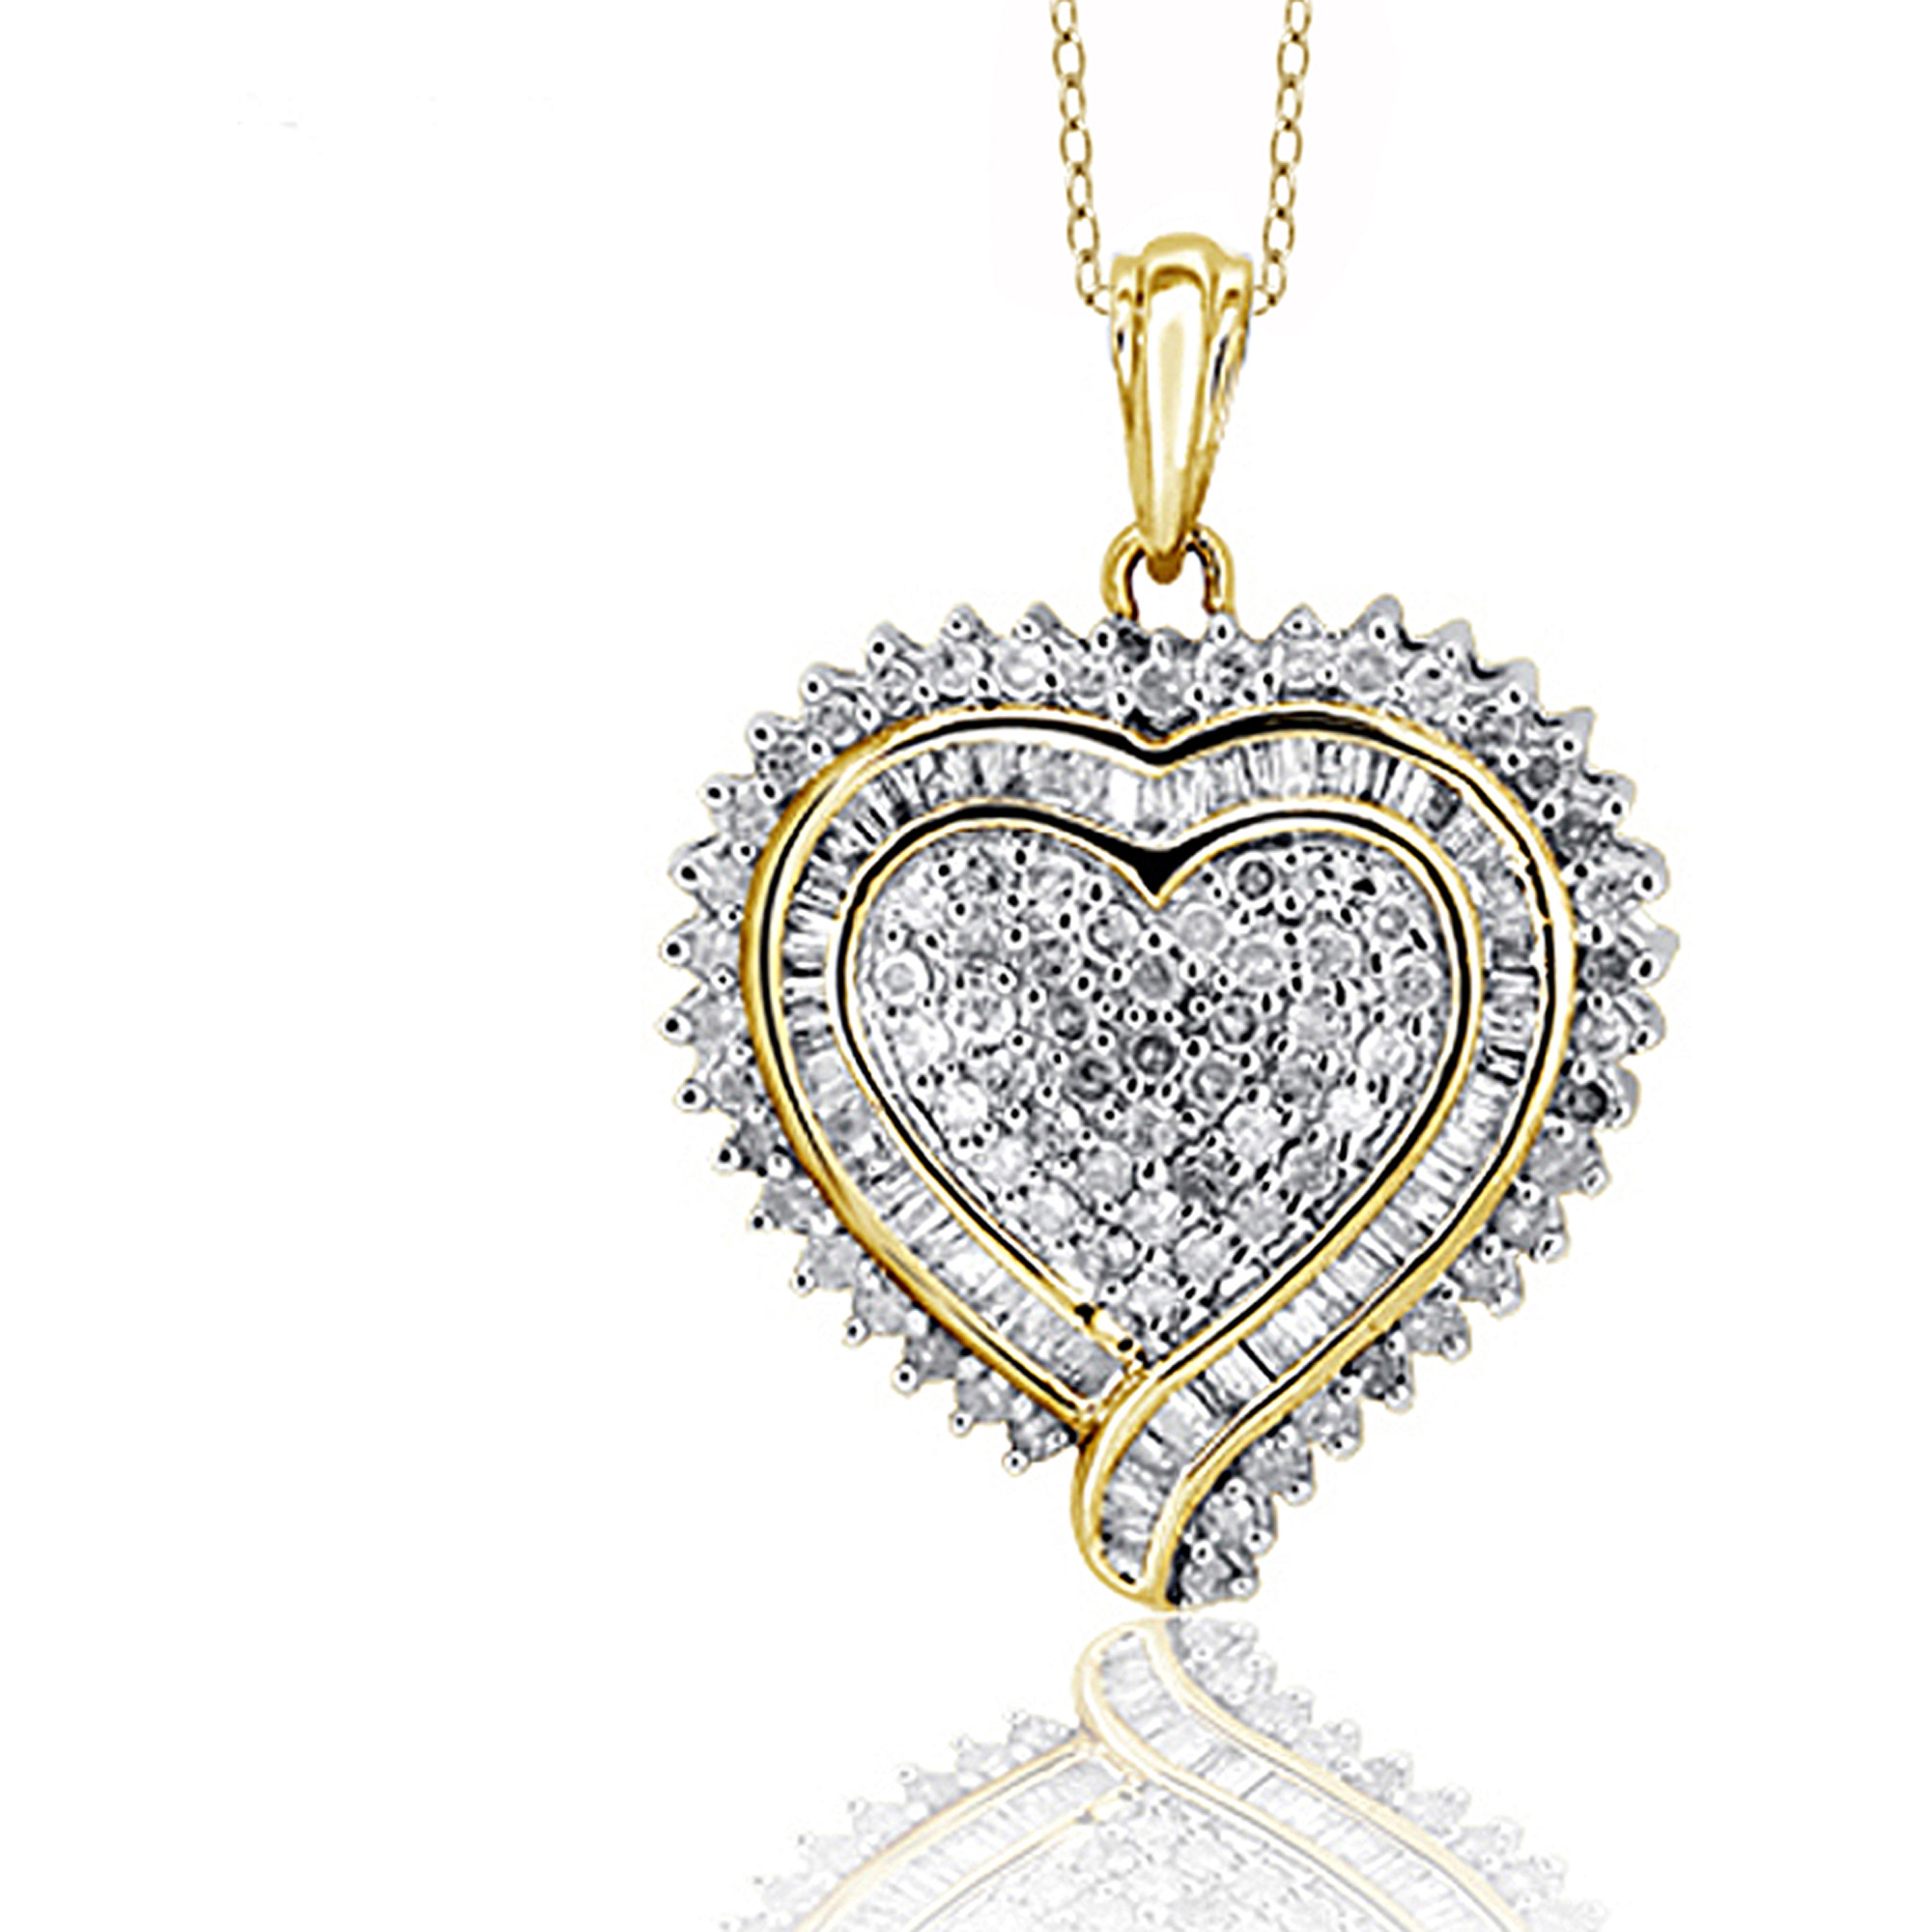 JewelersClub 1.00 Carat T.W. White Diamond Gold over Silver Heart Pendant by JewelersClub